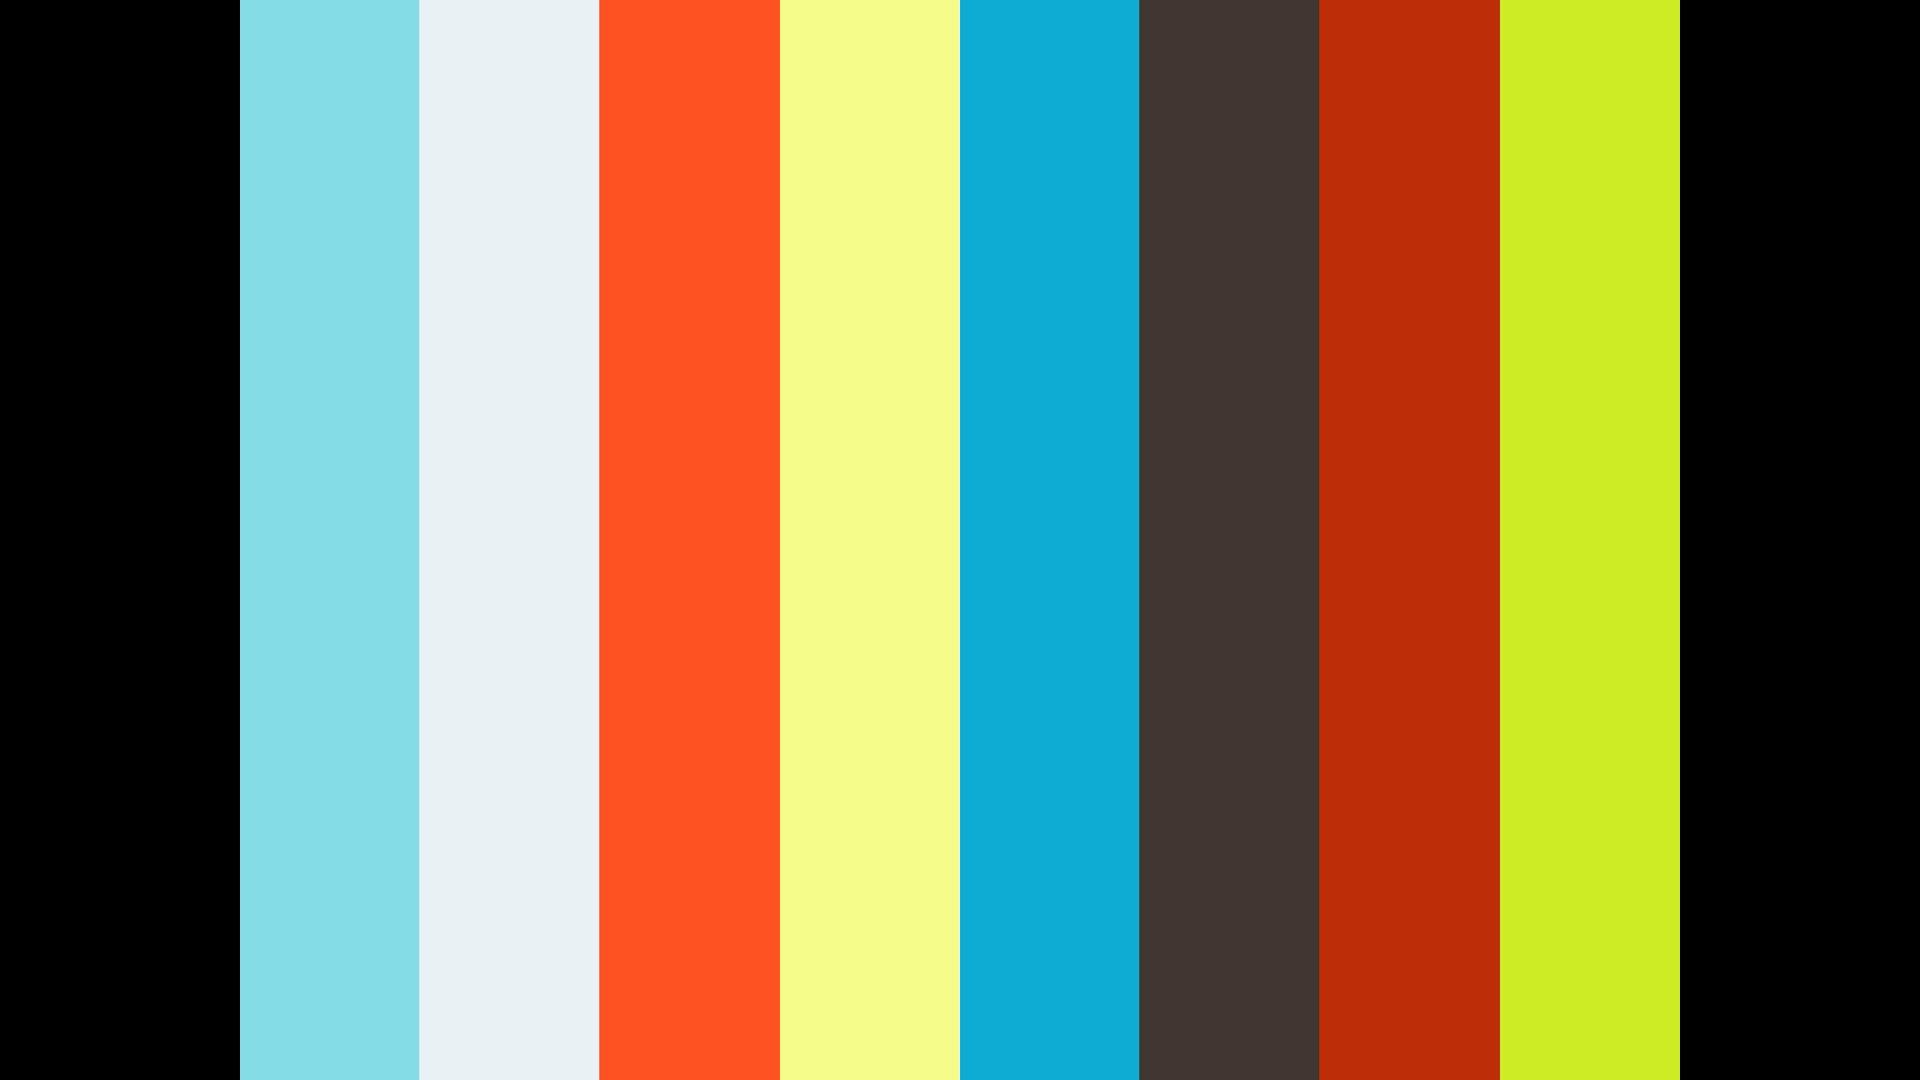 2020-02-16 ILOT TENIA - SKYVIEW-3